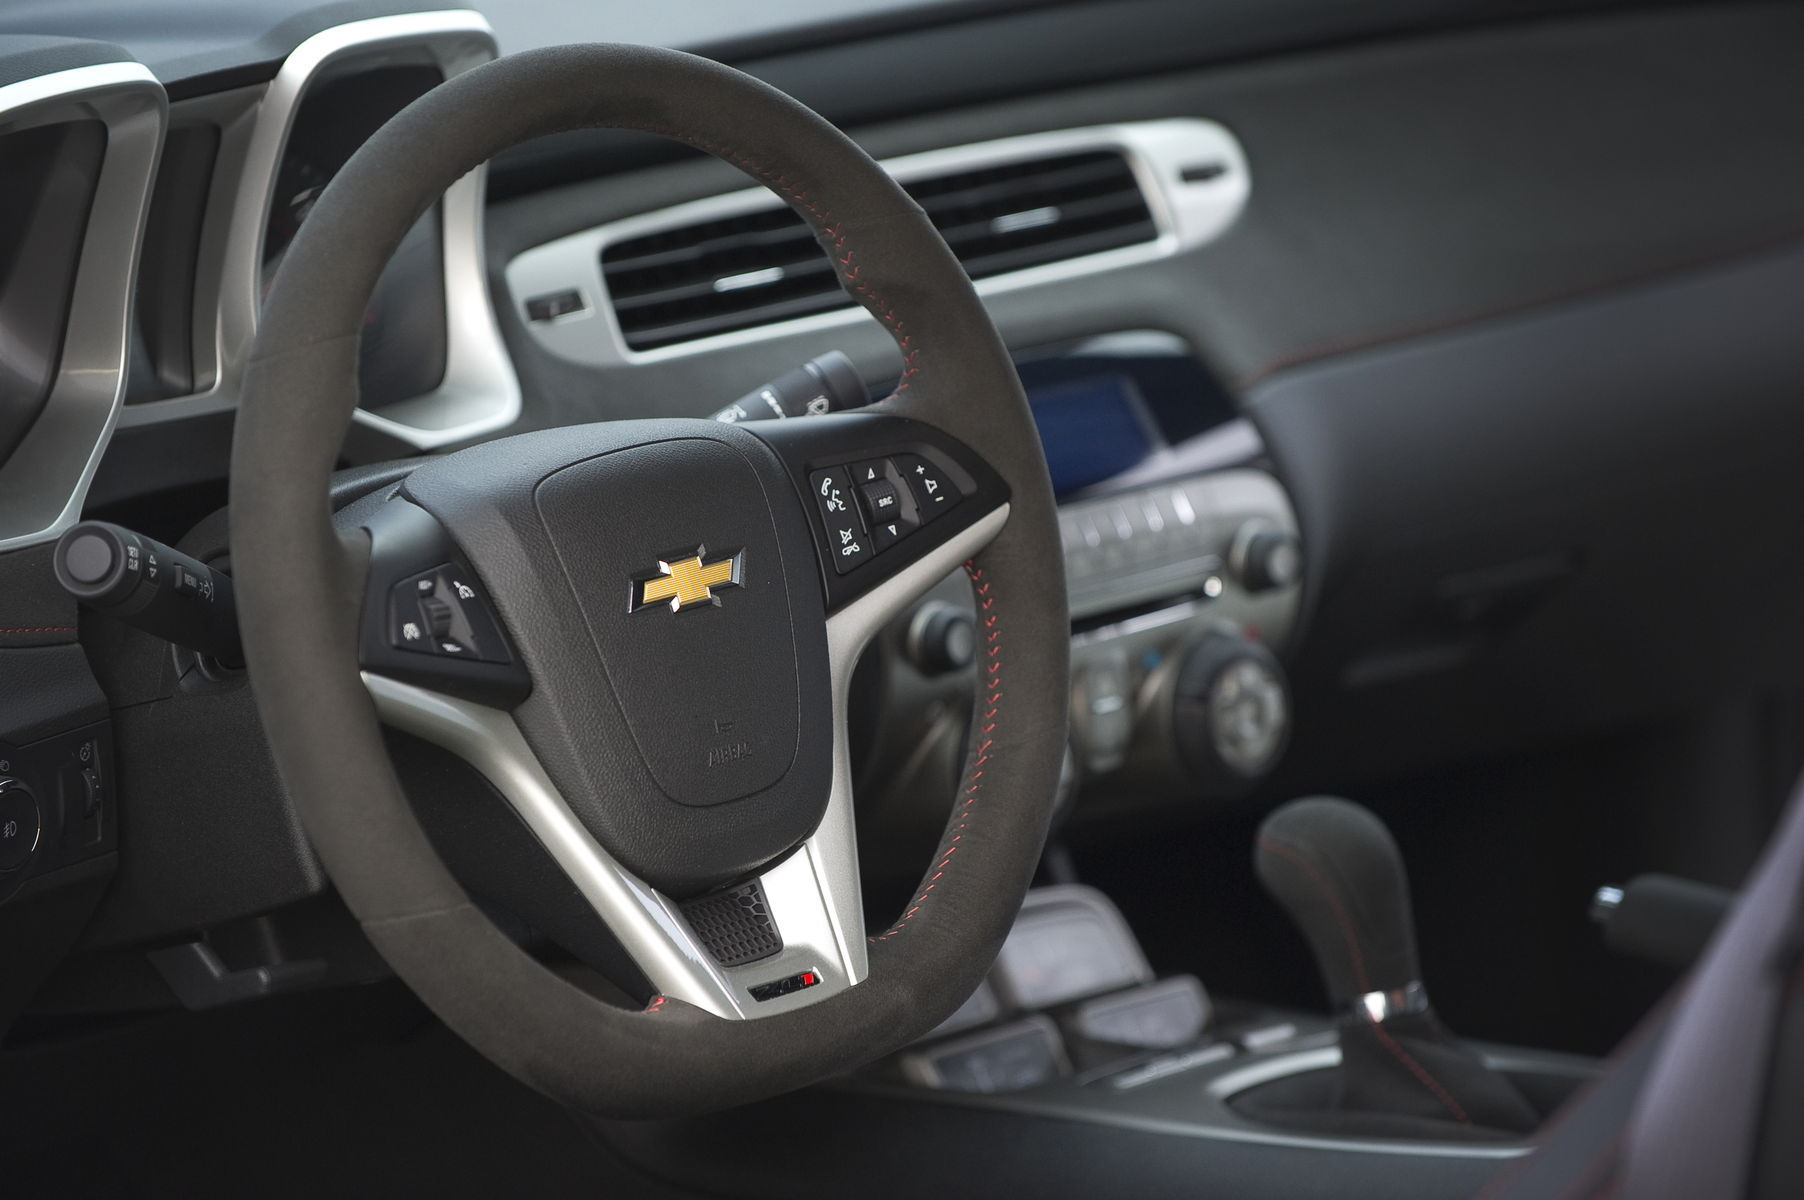 2015 Chevrolet Camaro | 2015 Chevrolet Camaro ZL1